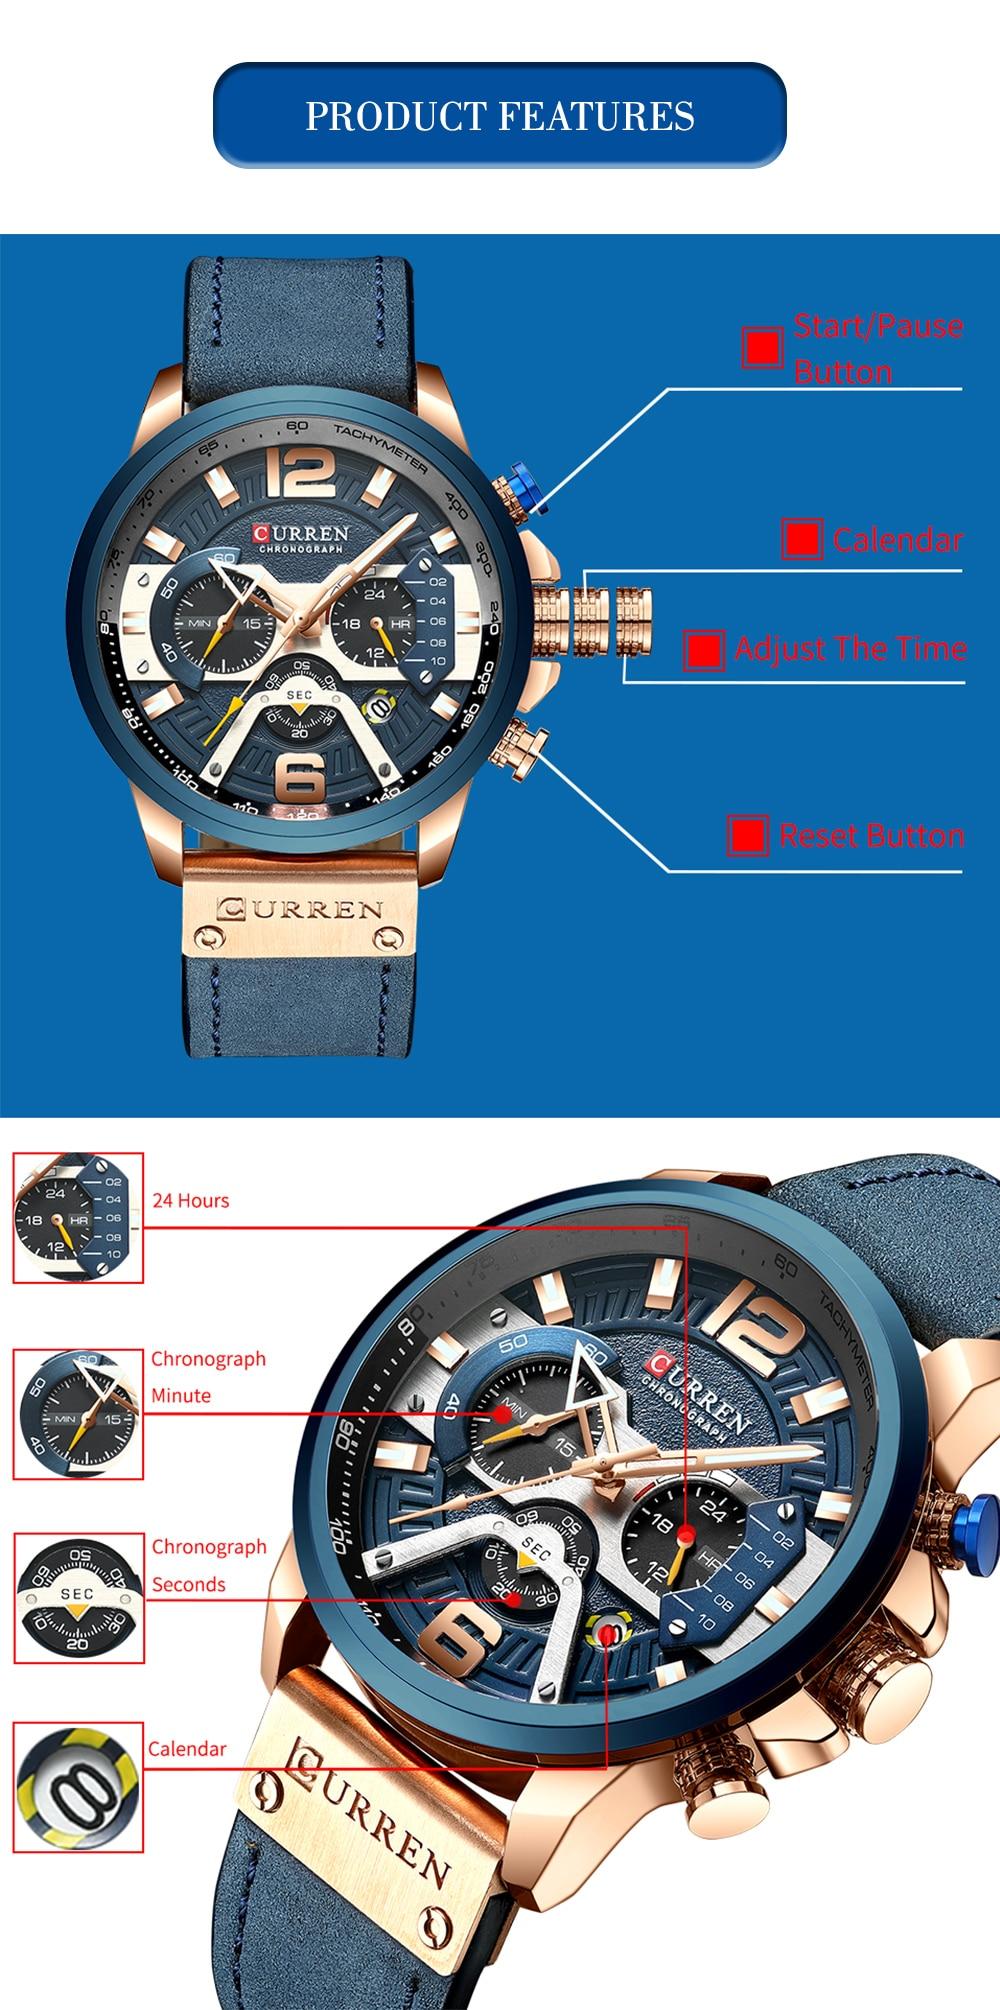 HTB131f7LFzqK1RjSZFvq6AB7VXaw CURREN Relogio Masculino Sport Watch Men Top Brand Luxury Quartz Men's Chronograph Date Military Wrist Watches Waterproof 8329